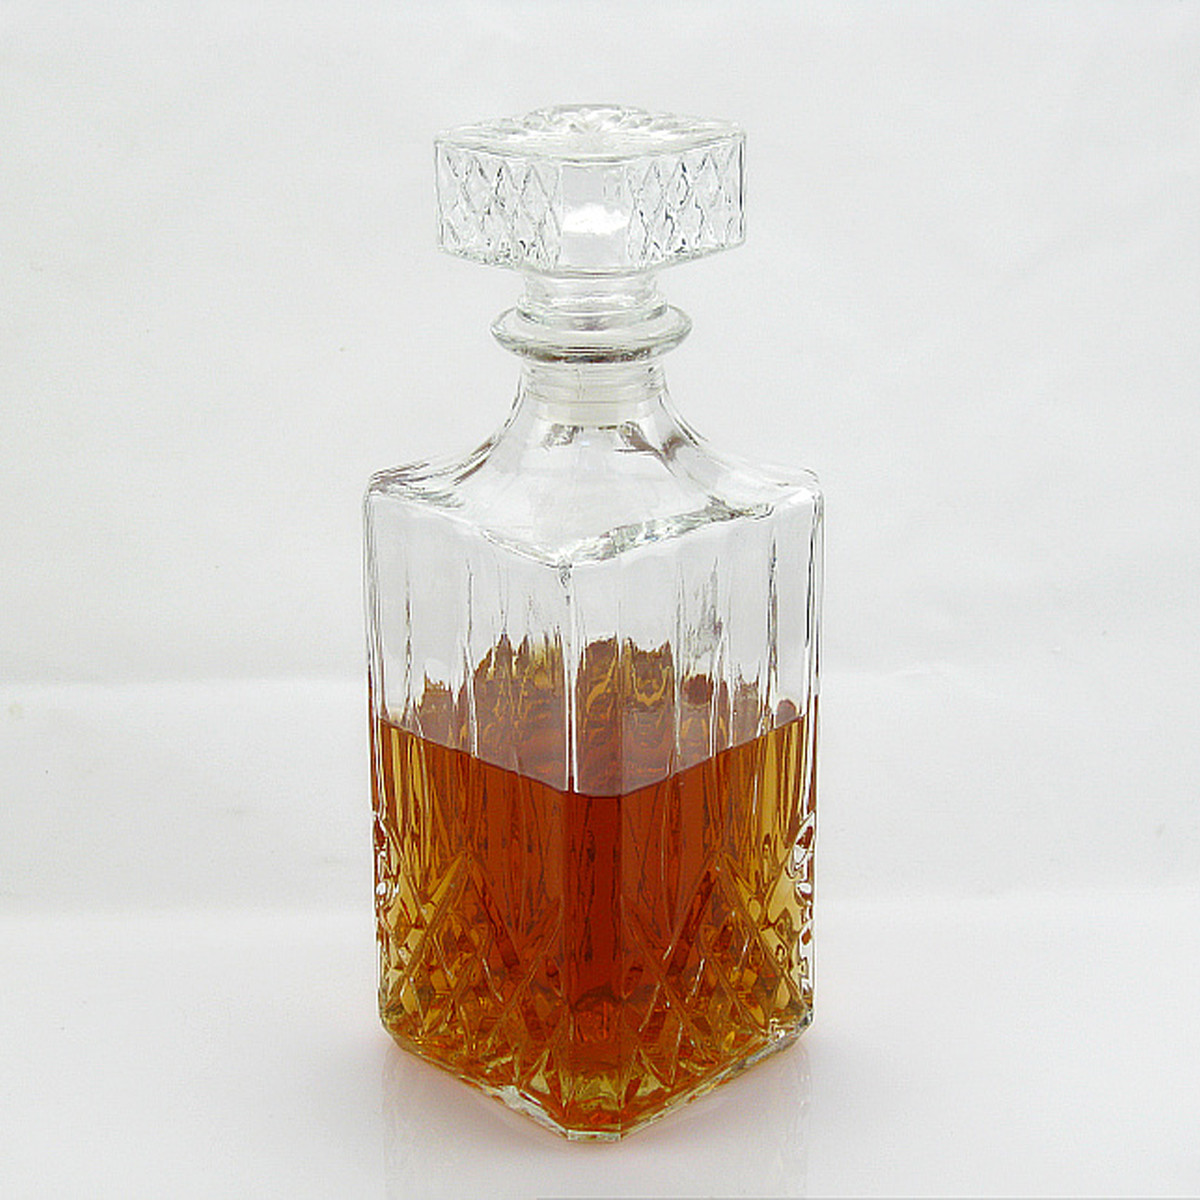 ... Anjing Peliharaan Kucing Kerah Dapat Disesuaikan PU Kulit Gesper Leher Tali Multi. Source · Vintage Decanter Glass Liquor Whiskey Crystal Bottle Wine ...